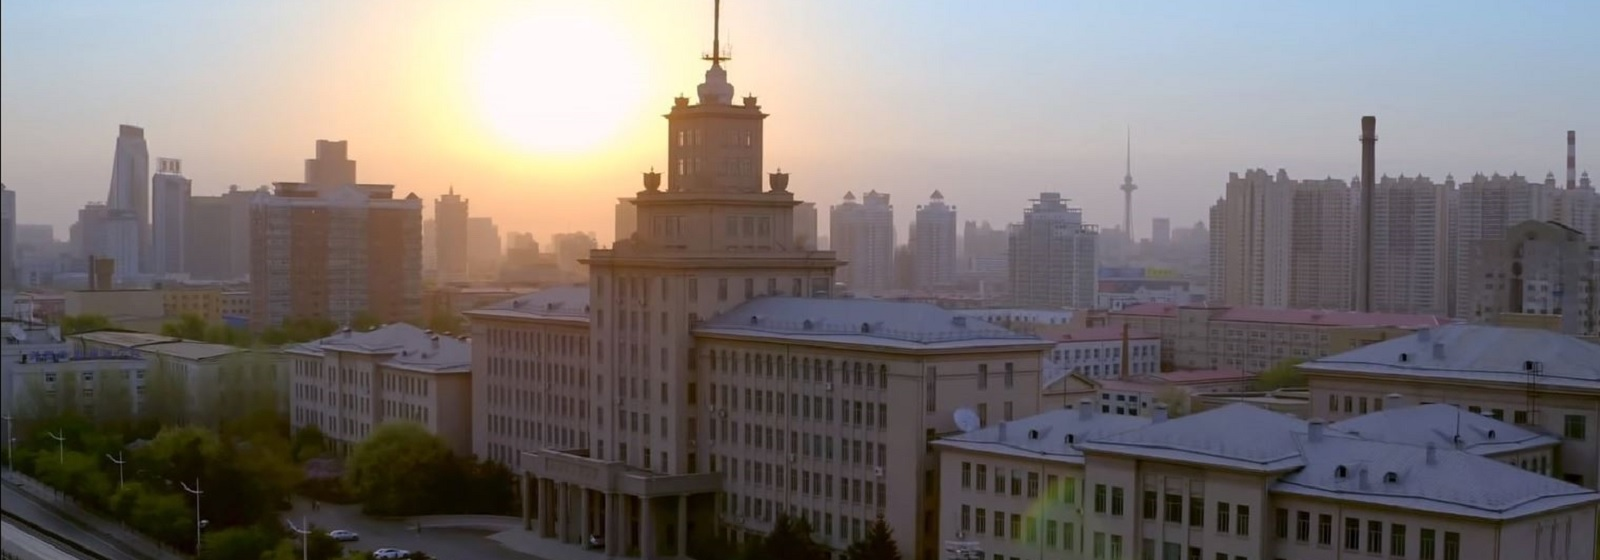 Харбинский политехнический университет • Best education for you